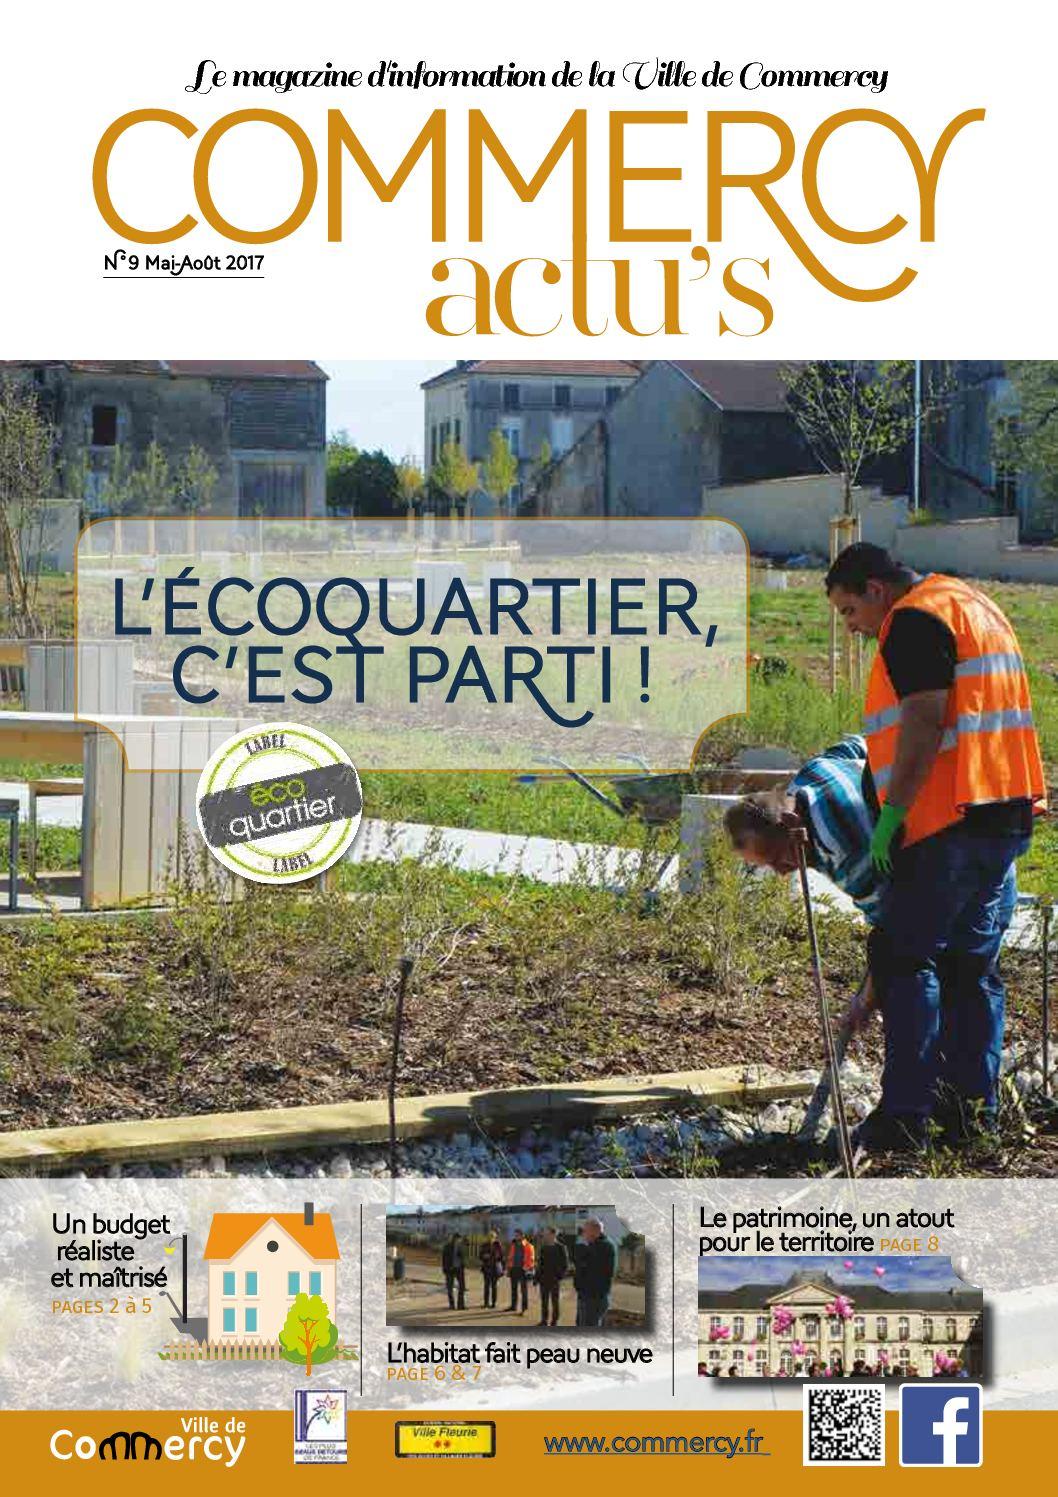 Commercy ACTU's - 9